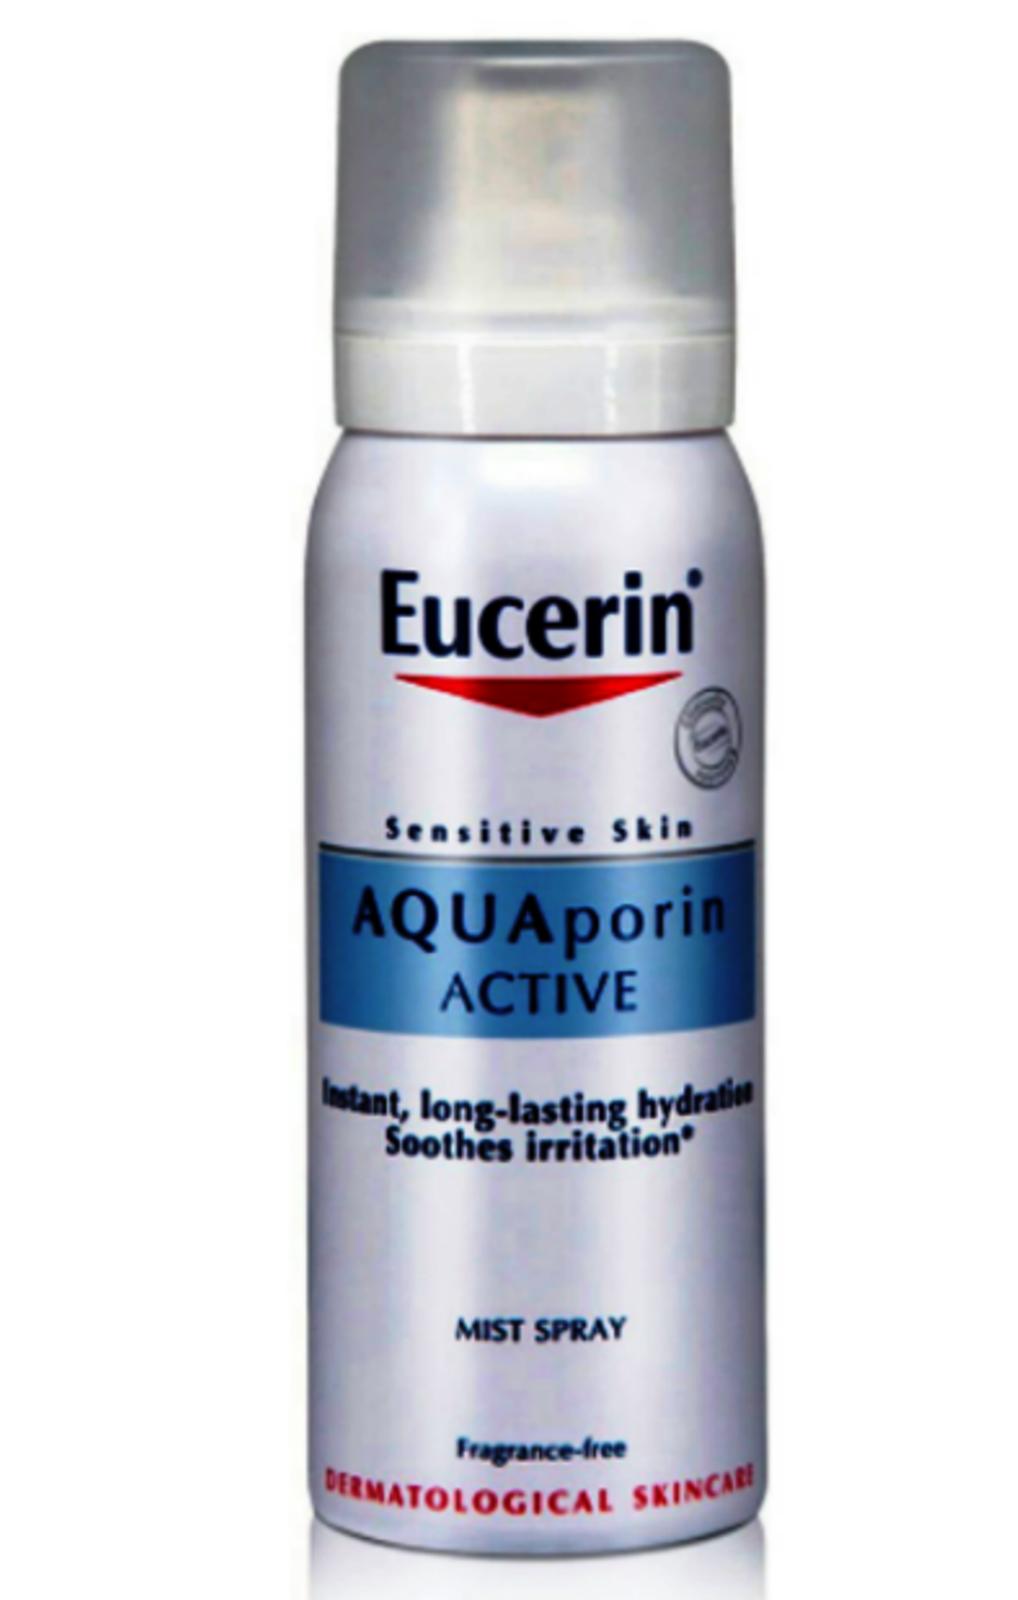 EUCERIN AQUAporin Active Mist 50ml Moisturizer Boost Hydrati